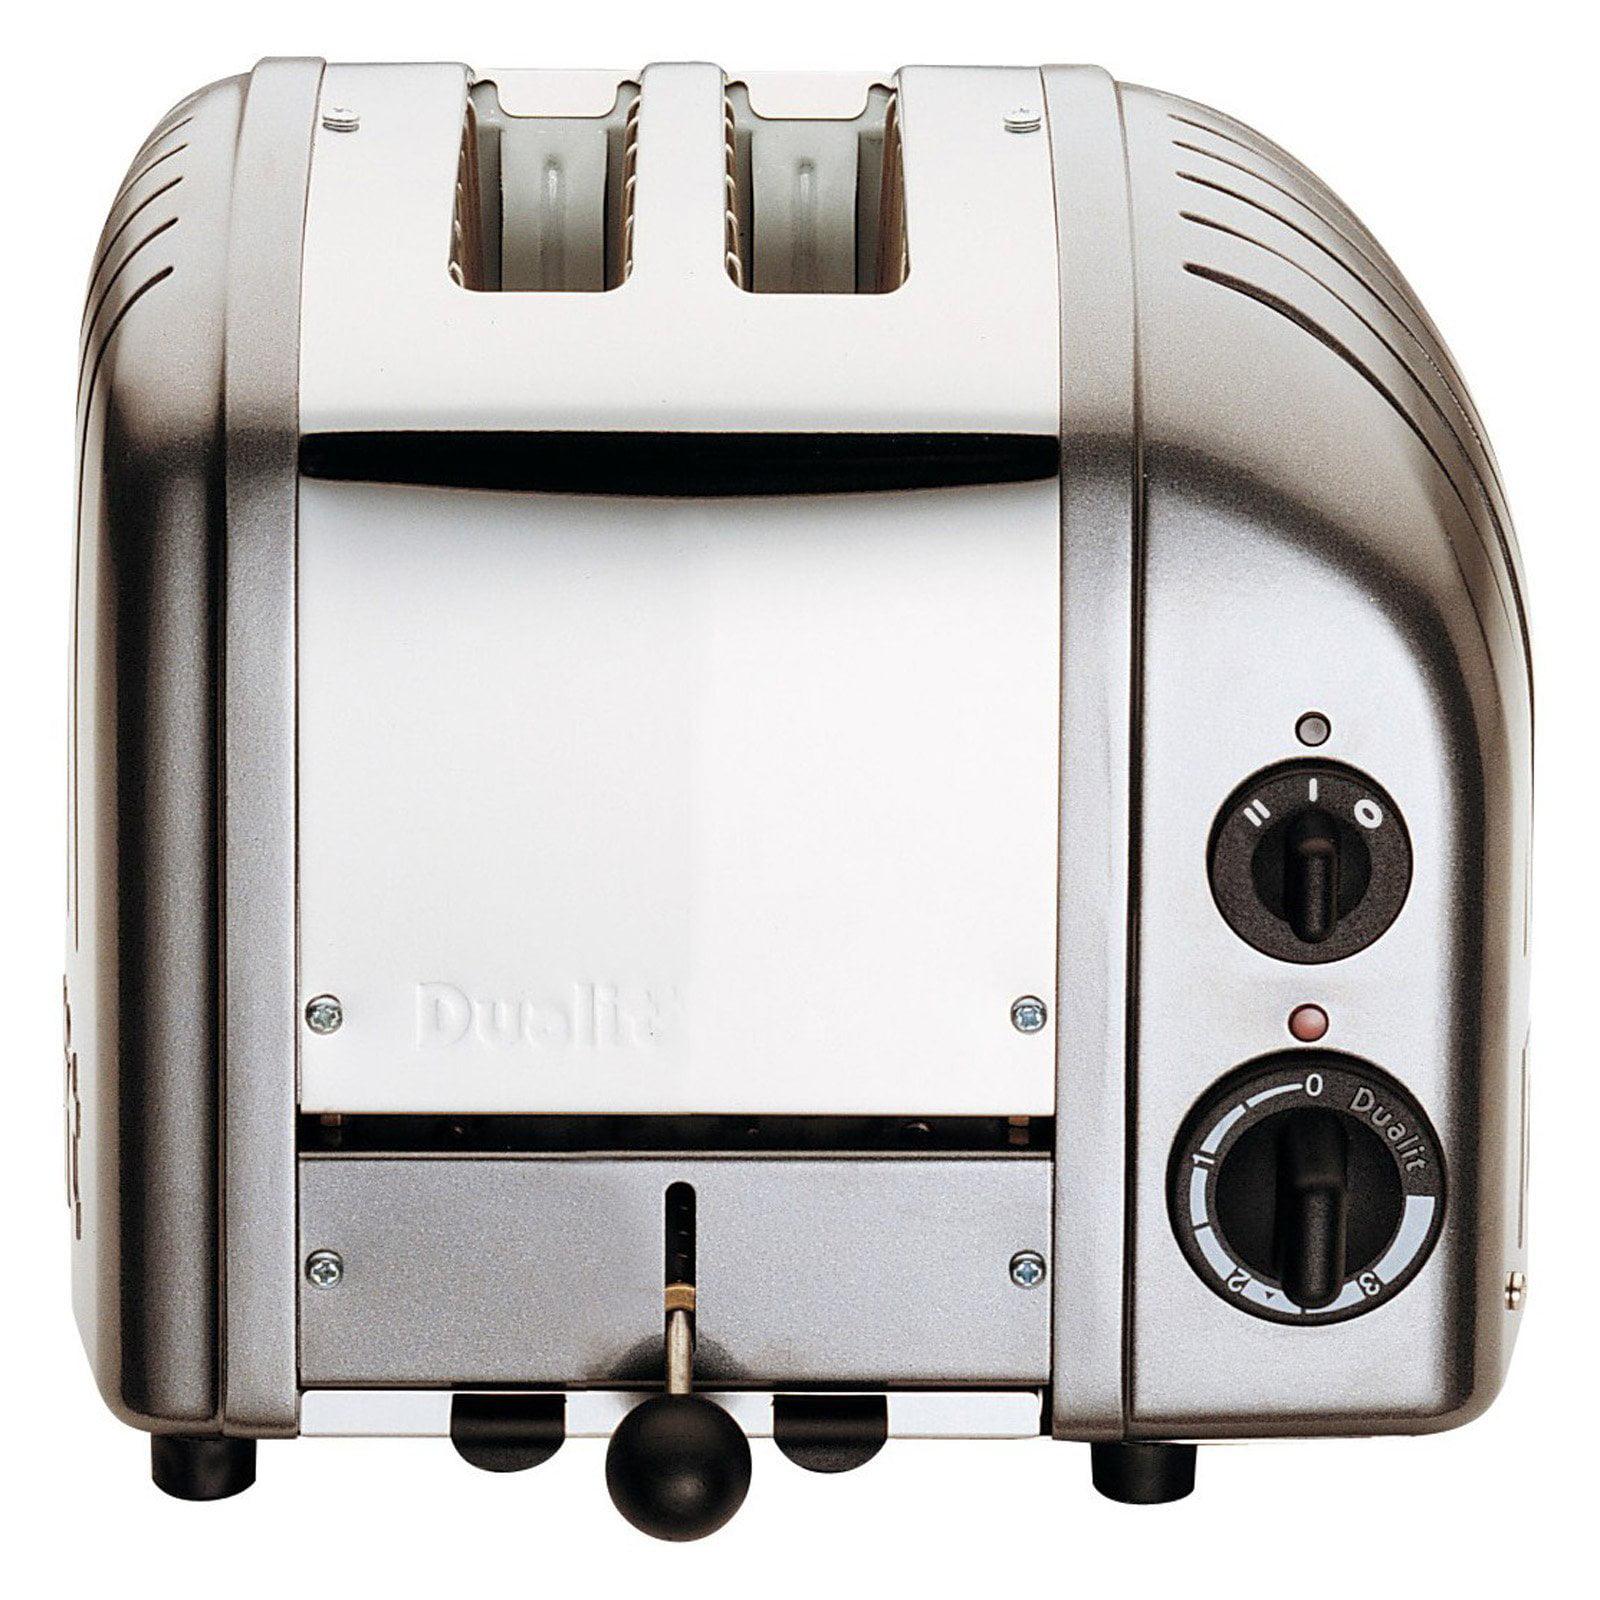 Dualit 20297 2 Slice NewGen Toaster - Metallic Charcoal